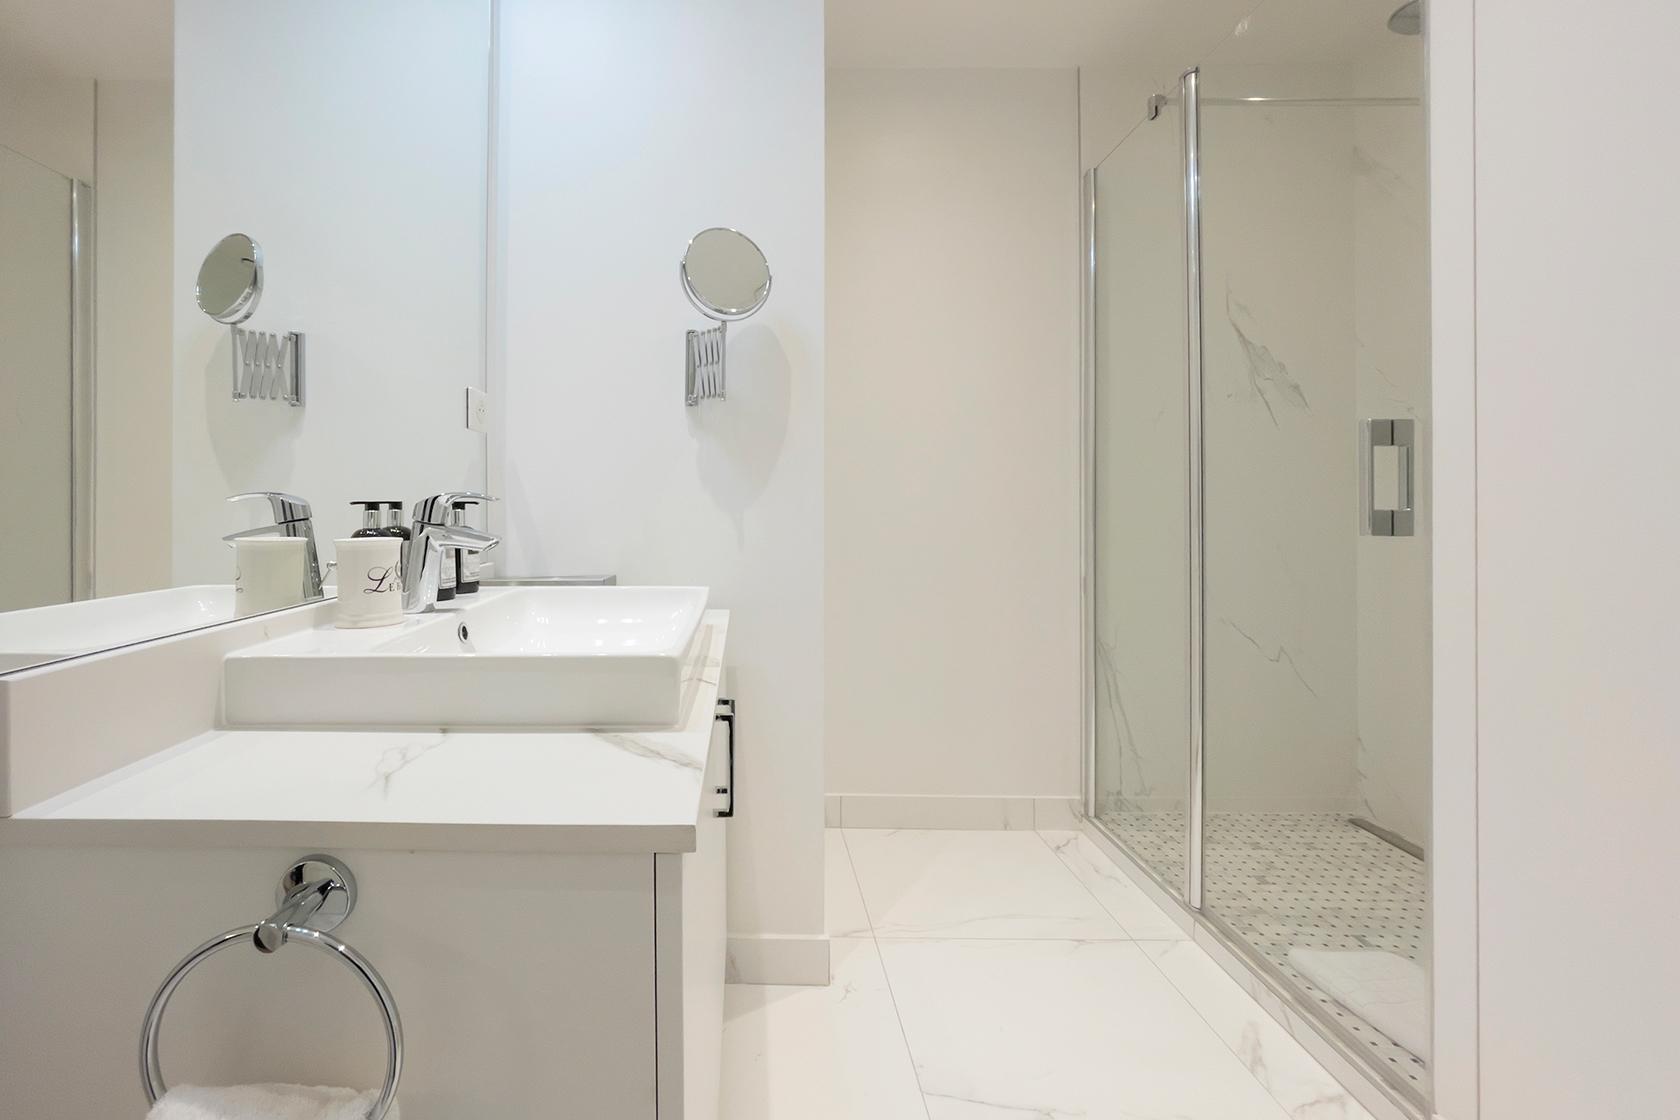 Beaujolais master bathroom After